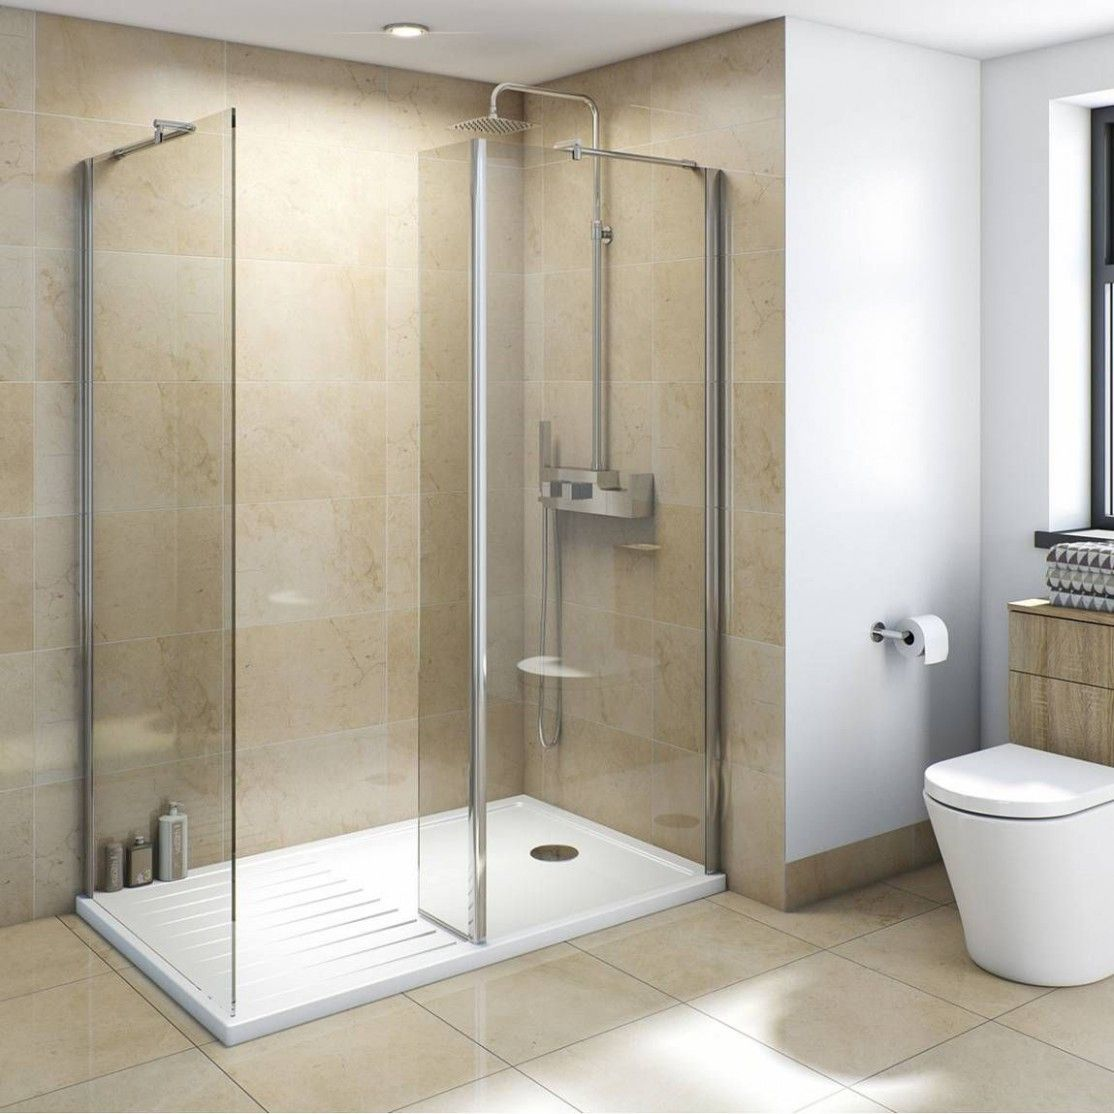 Victoria Plumb Bathroom Wall In 2020 Walk In Shower Enclosures Shower Cubicles Ensuite Shower Room